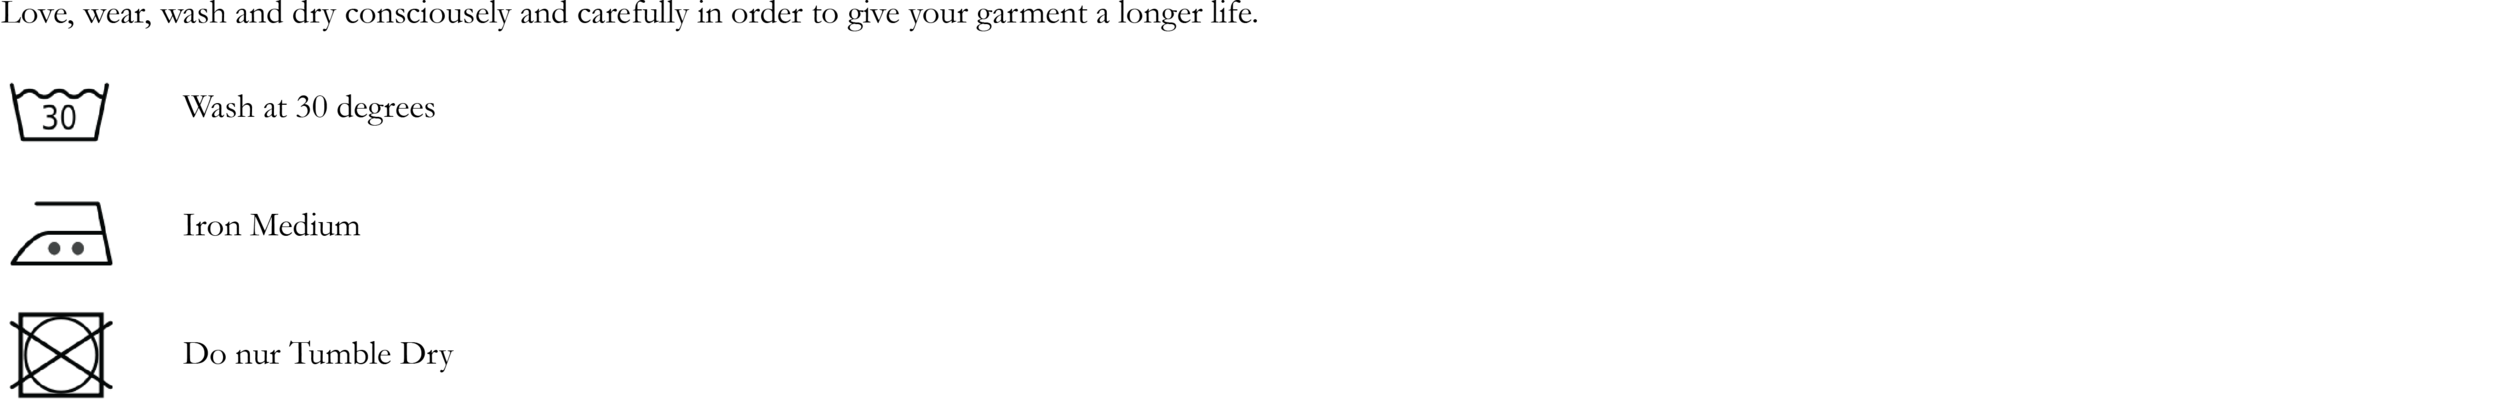 Washininstructions_30degrees-01.png